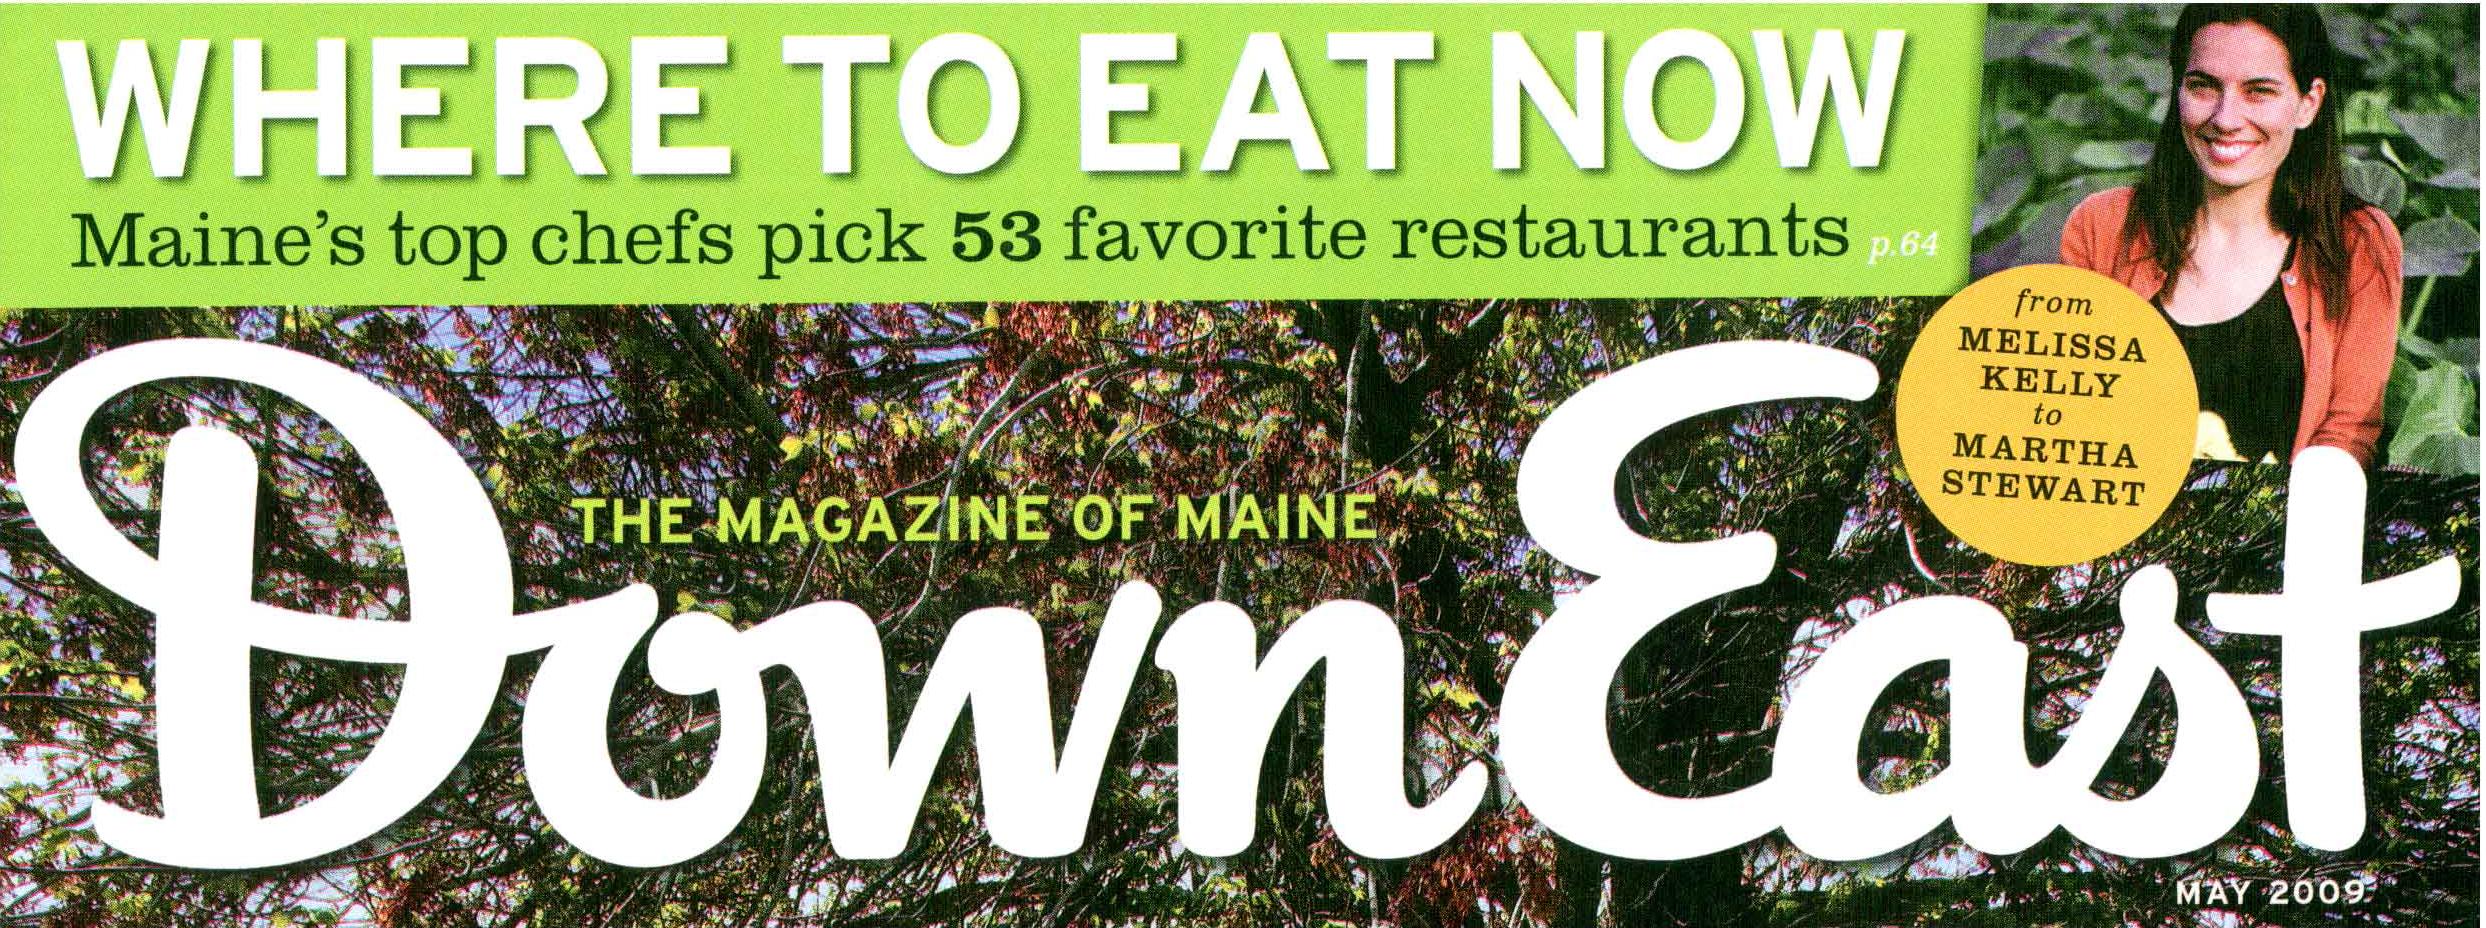 Downeast Magazine,  Martha Stewart,  Melissa Kelly,  Mark Gaier, Clark Frasier,